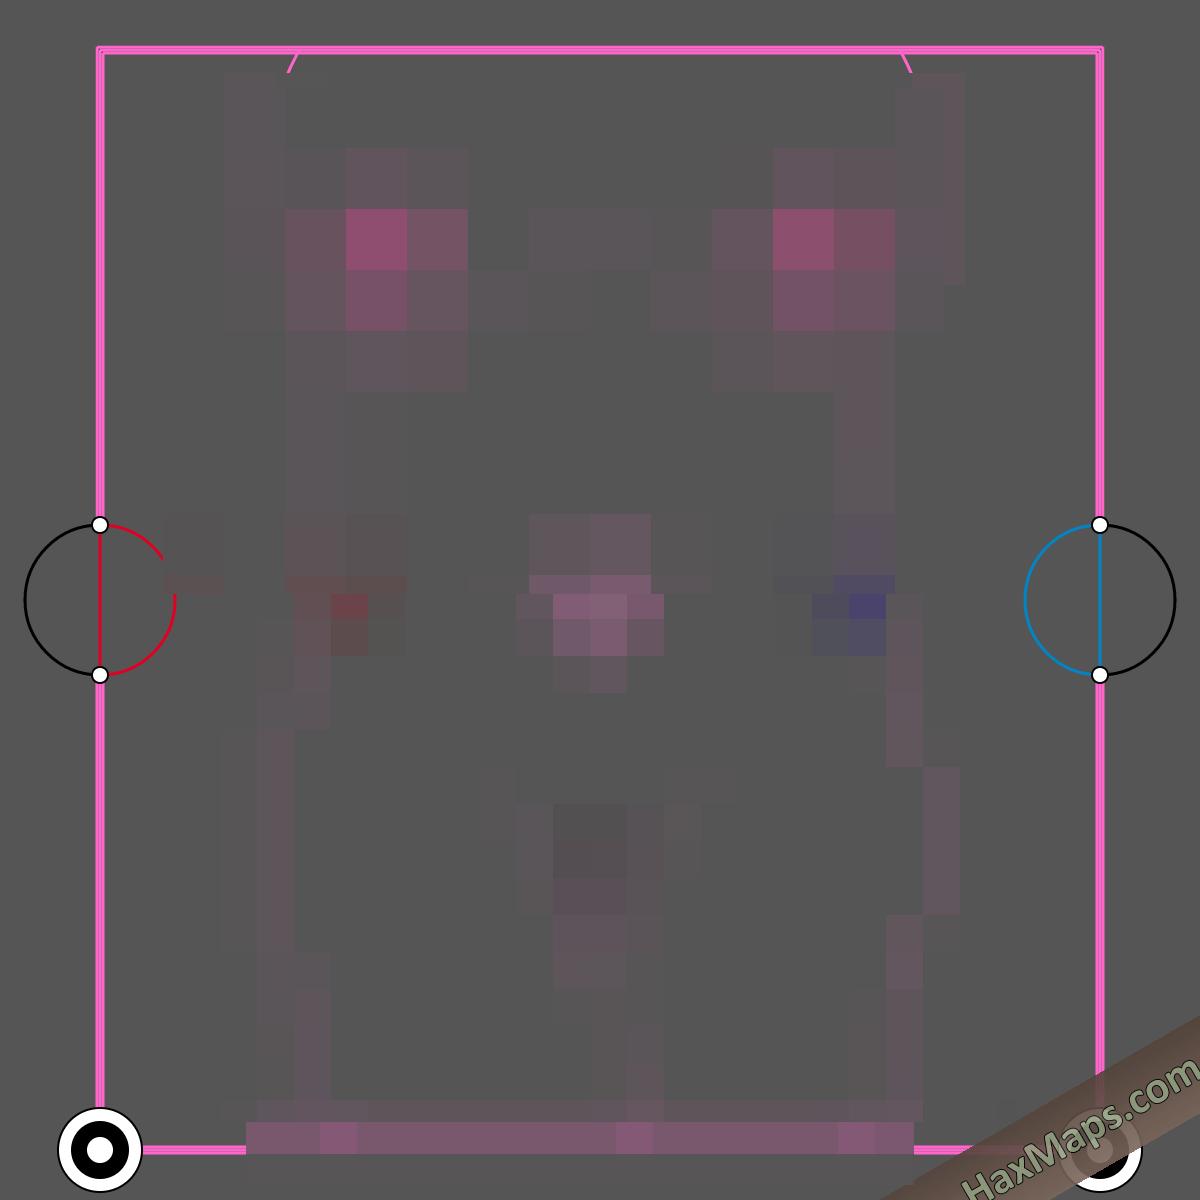 hax ball maps | Naked Hax